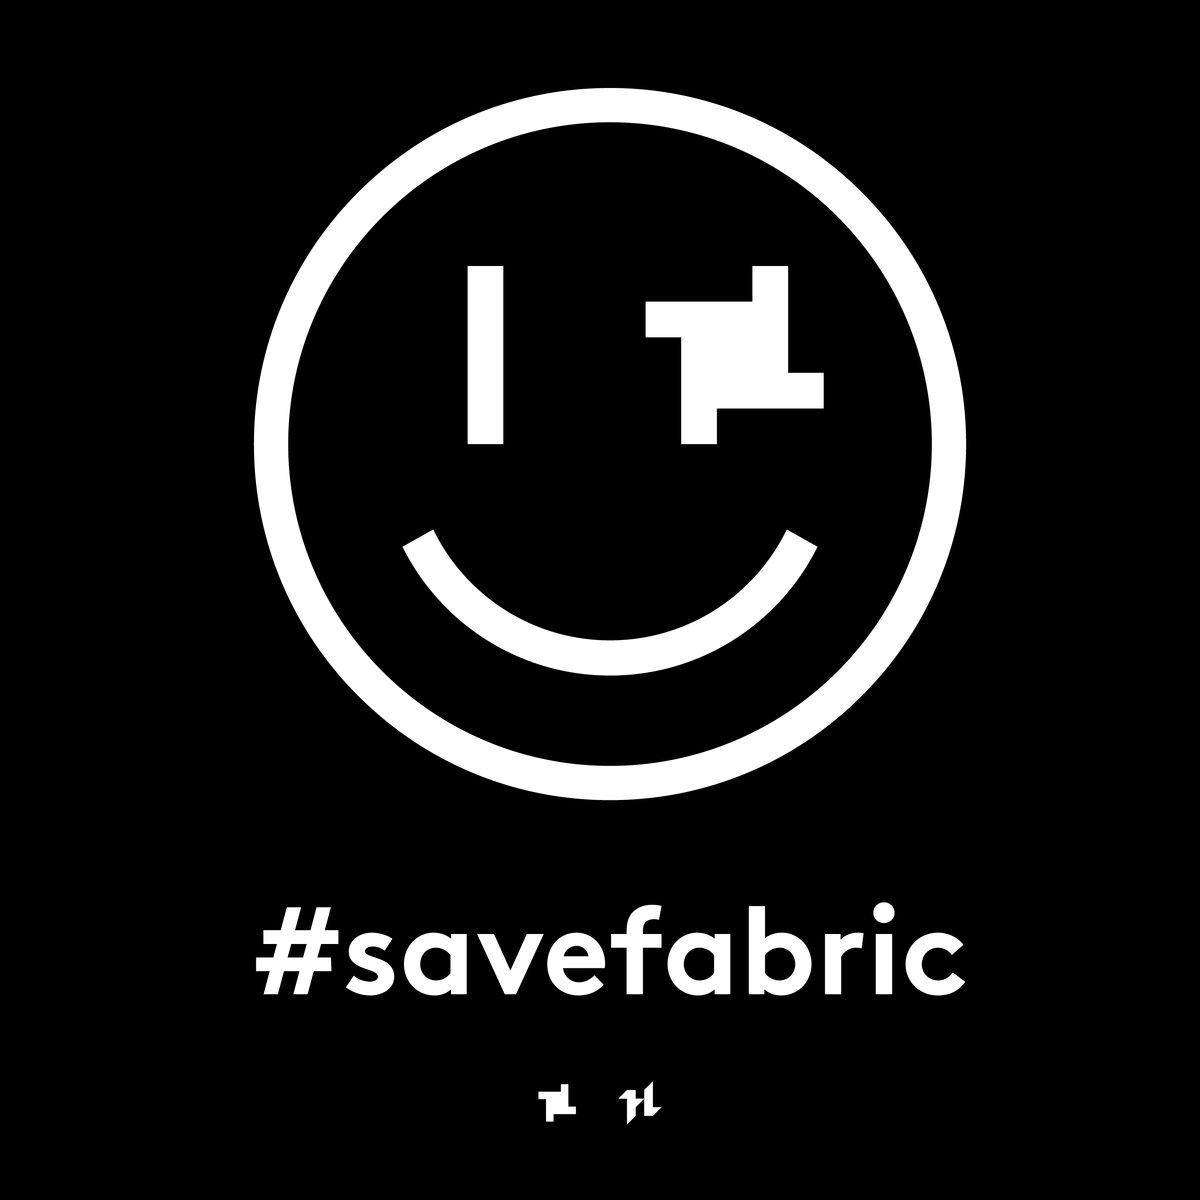 #savefabric compilation